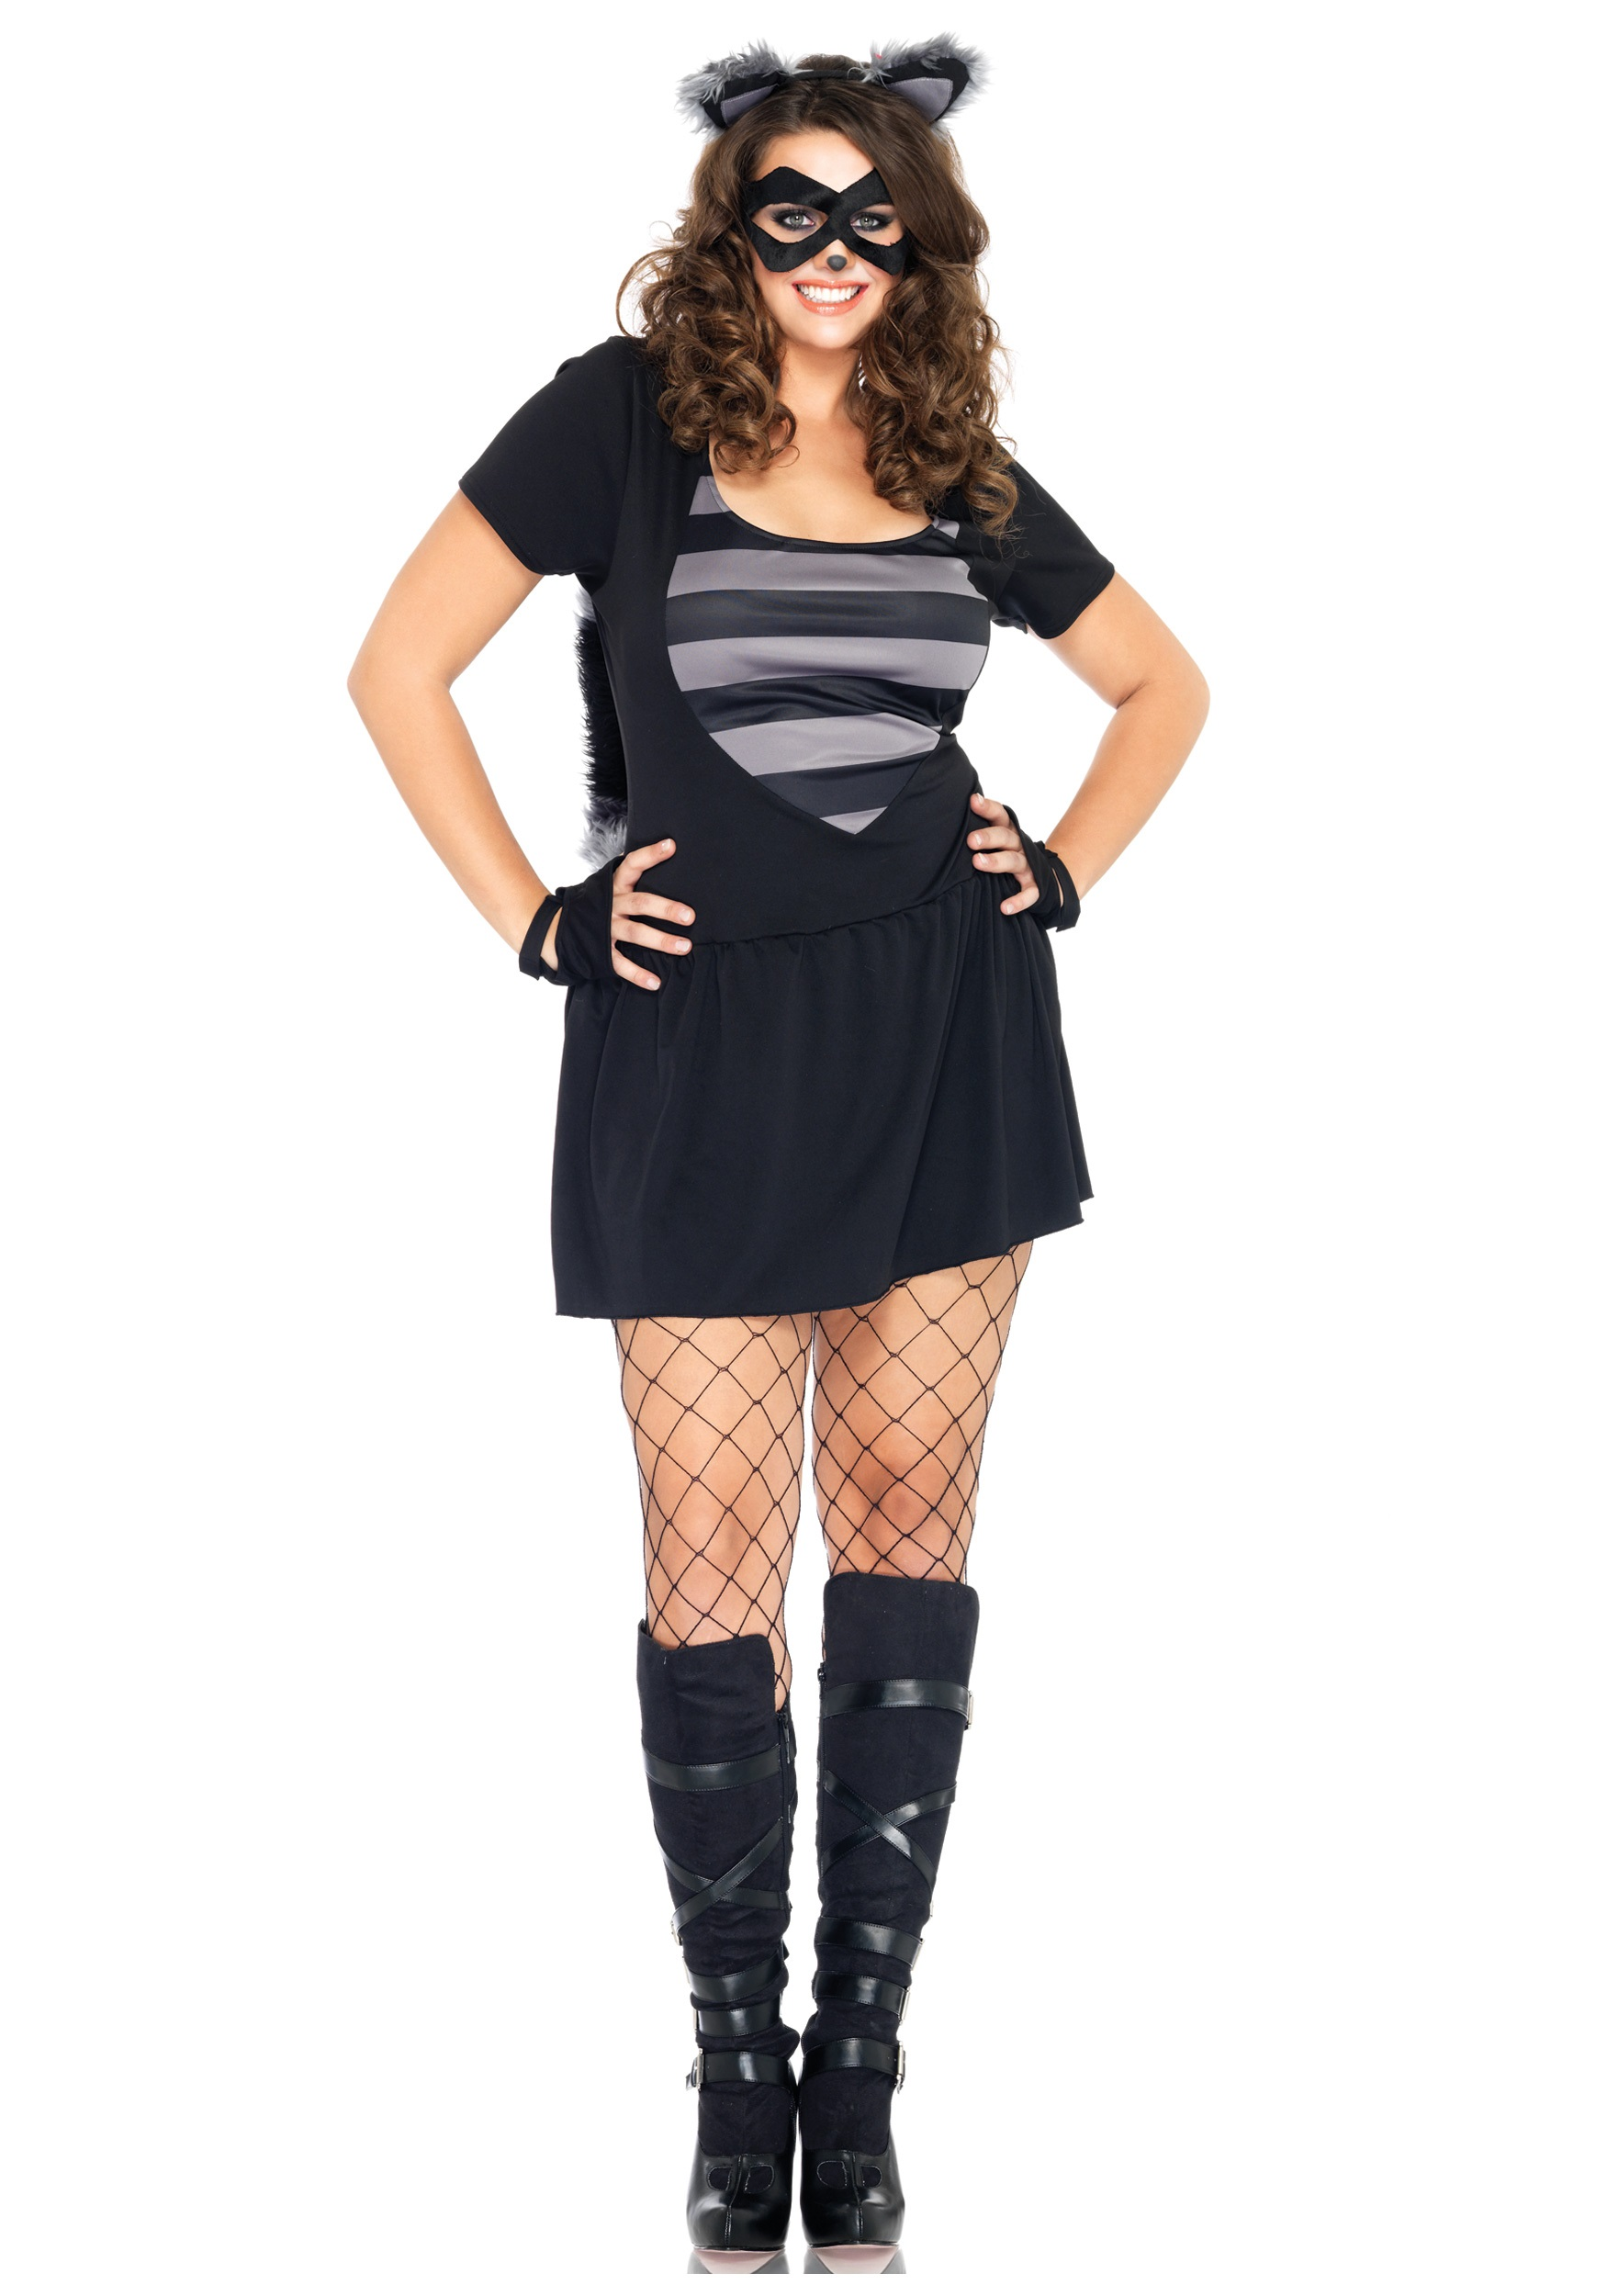 Plus Size Sexy Raccoon Costume  sc 1 st  Halloween Costumes & Plus Size Sexy Raccoon Costume - Halloween Costumes